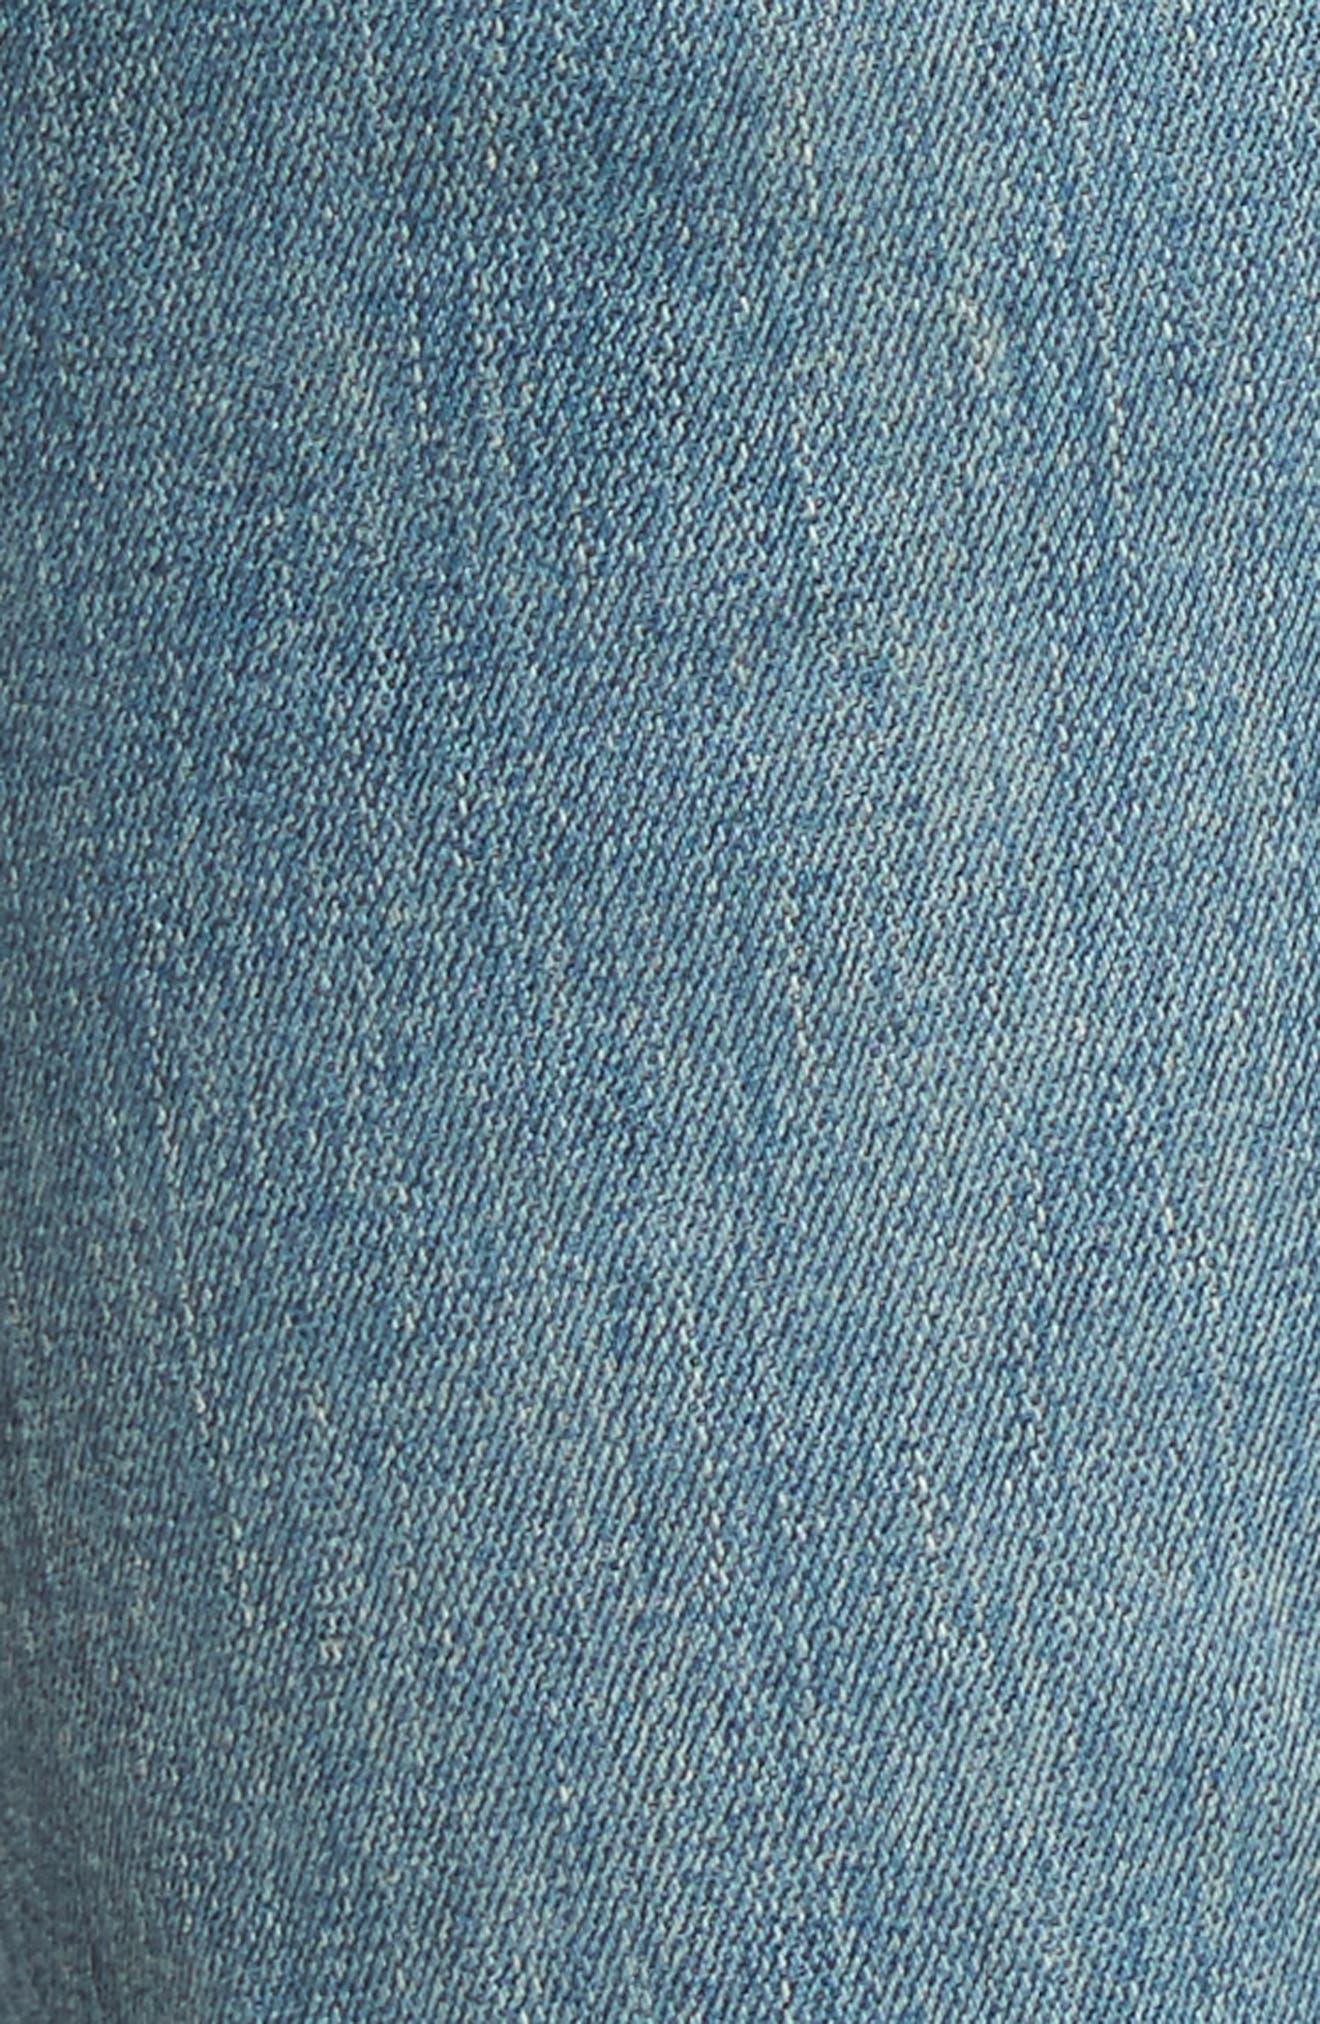 Rocket High Waist Skinny Jeans,                             Alternate thumbnail 6, color,                             465